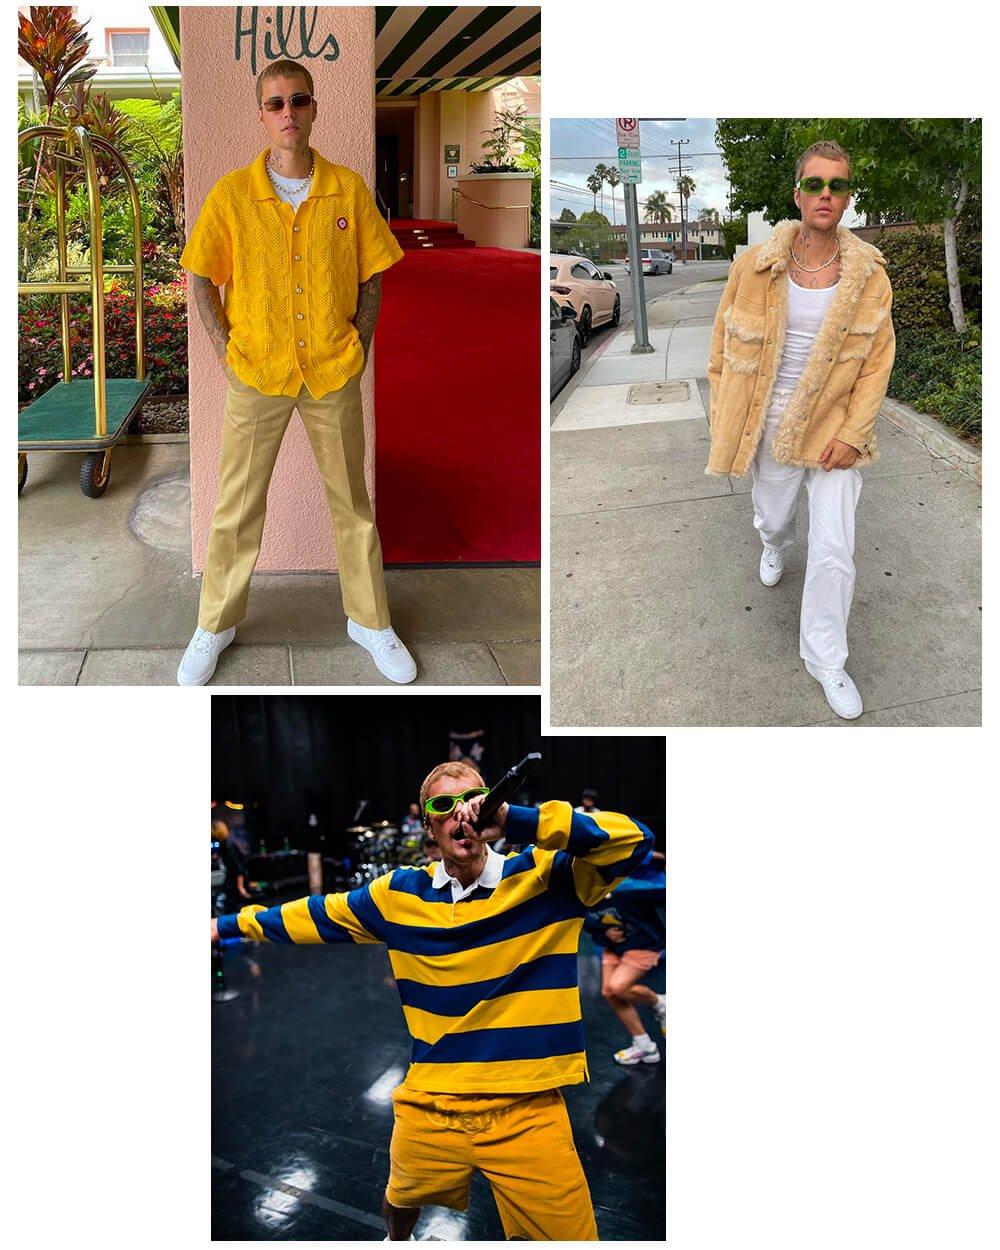 It girls - homens estilosos - homens estilosos - Inverno - Street Style - https://stealthelook.com.br